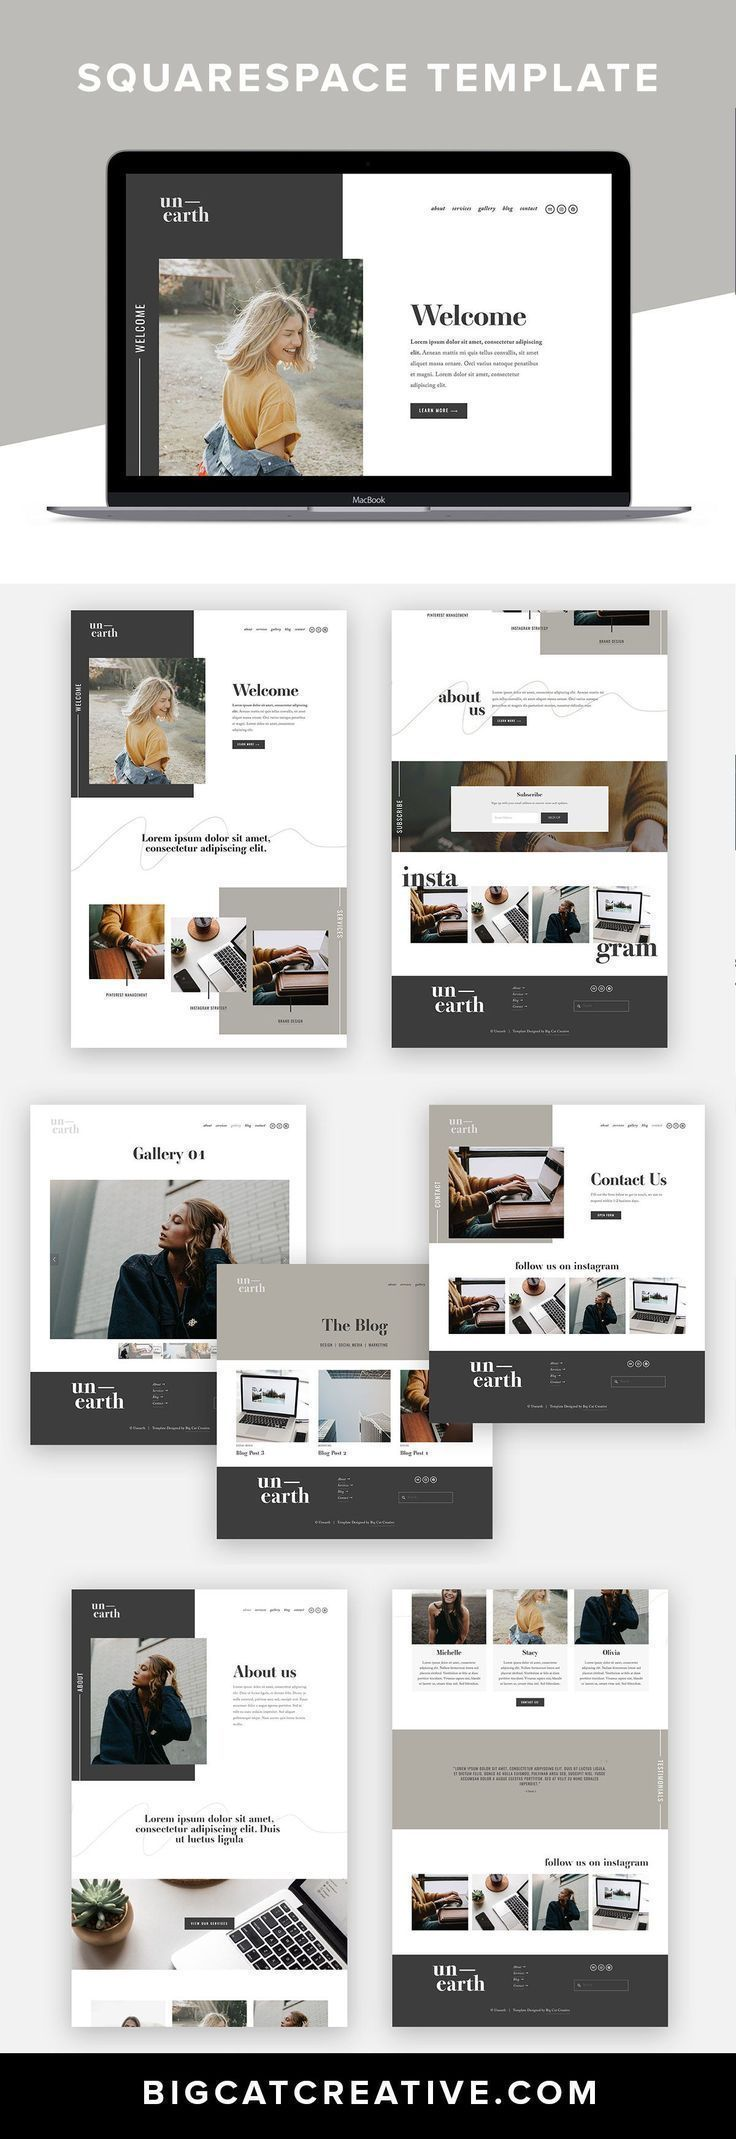 Wordpress Minimal Theme Website Templates From Themeforest Wordpress Minimal Theme In 2020 Website Design Wordpress Squarespace Website Design Wordpress Web Design